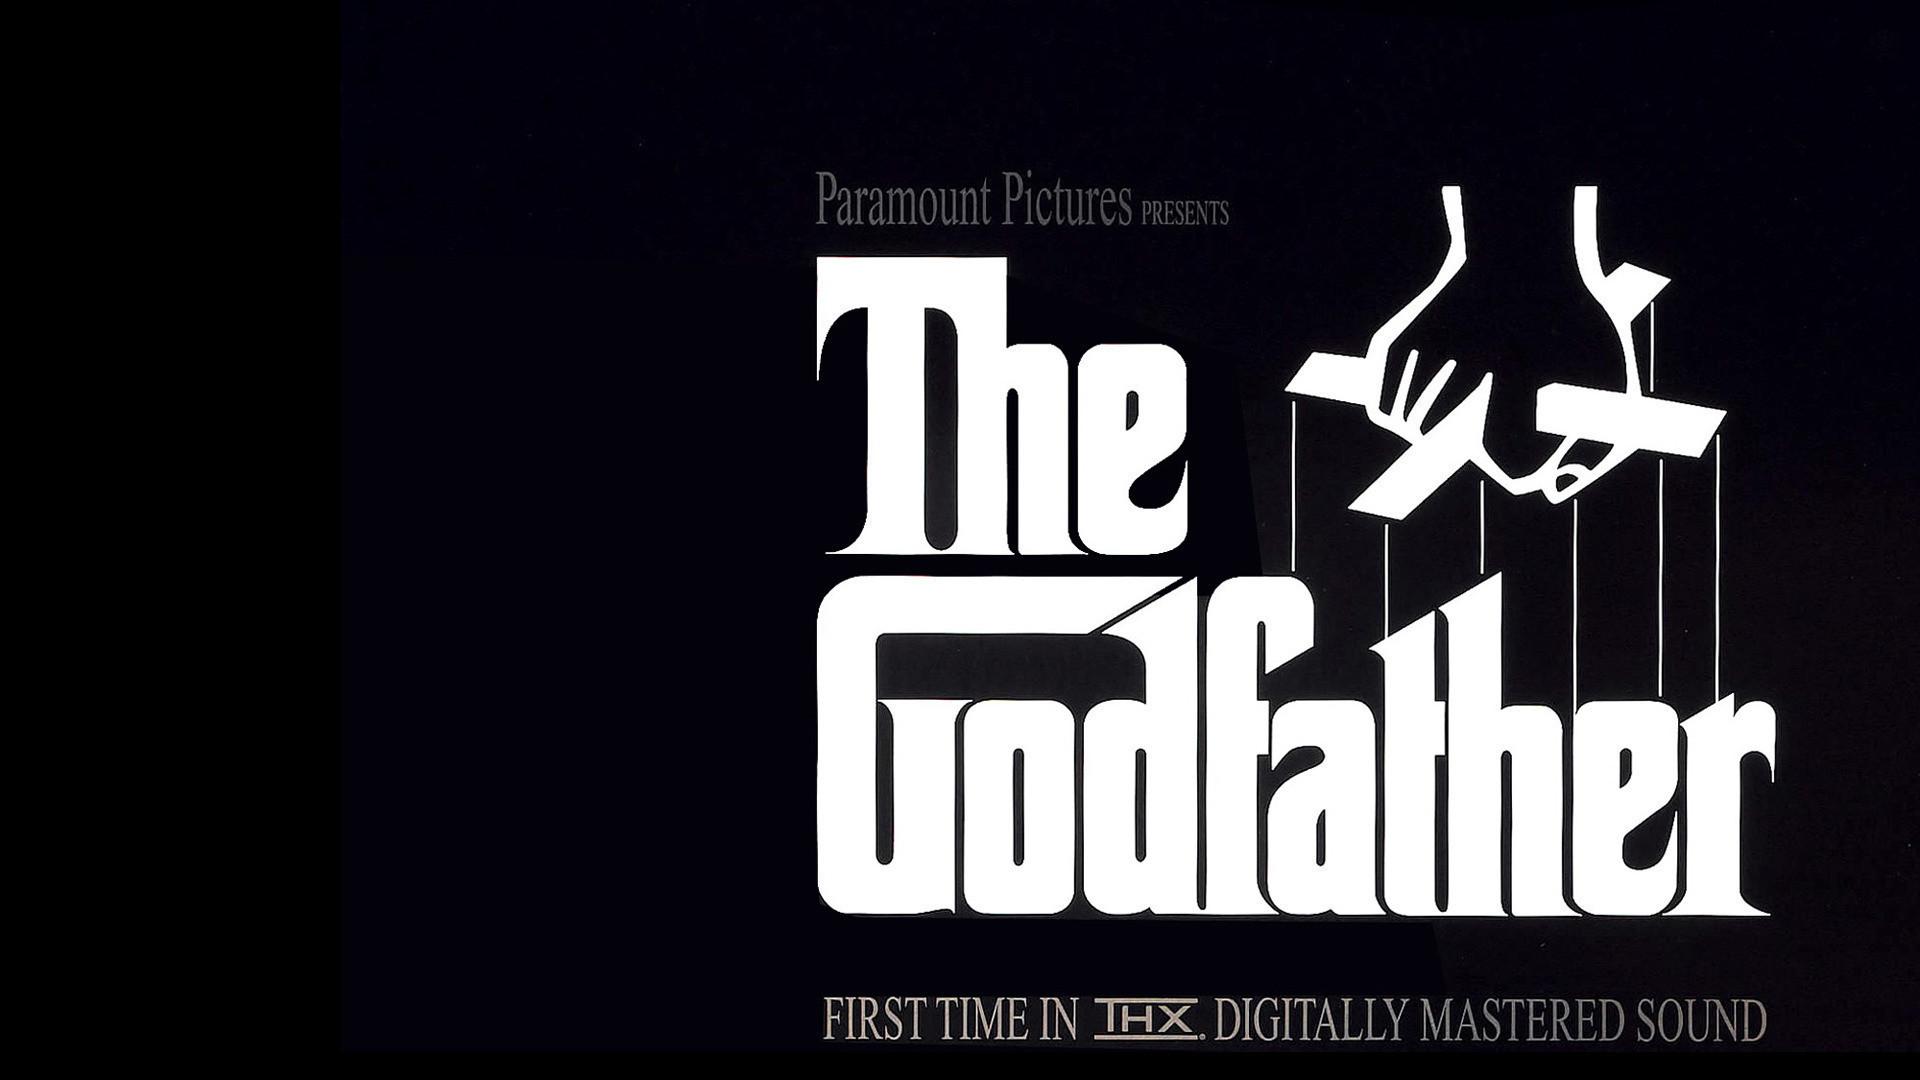 Res: 1920x1080, THE GODFATHER Crime Drama mafia poster g wallpaper      179633    WallpaperUP